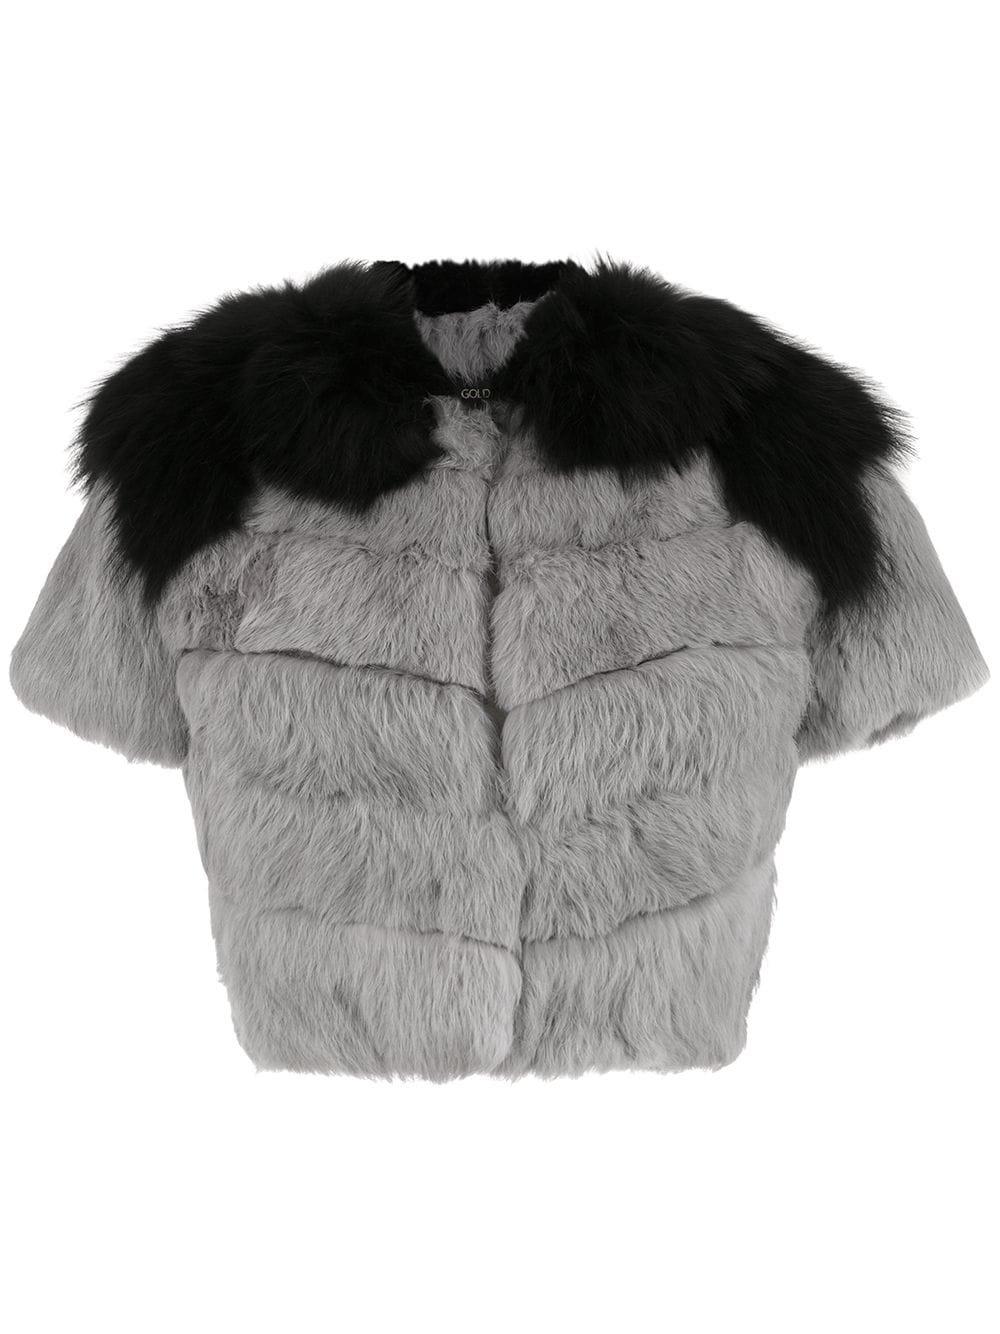 Andrea Bogosian fur blouse